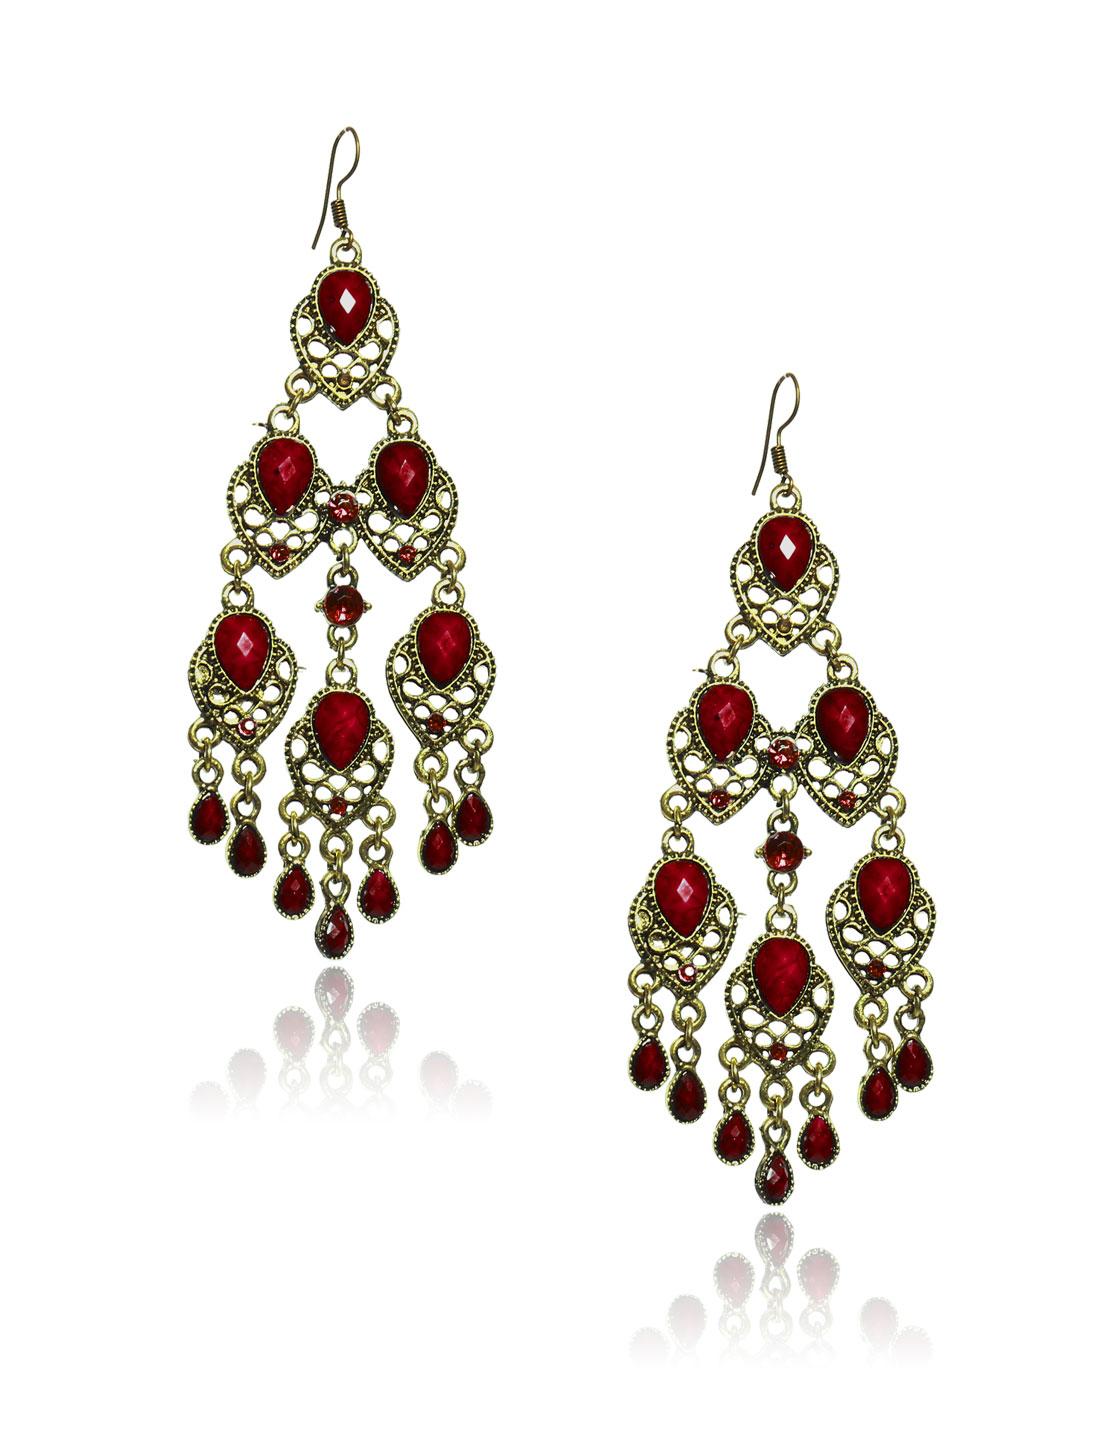 Women Retro Red three-layer Shaped Crystal Resin Drop Dangle Hook Earring Ear Stud